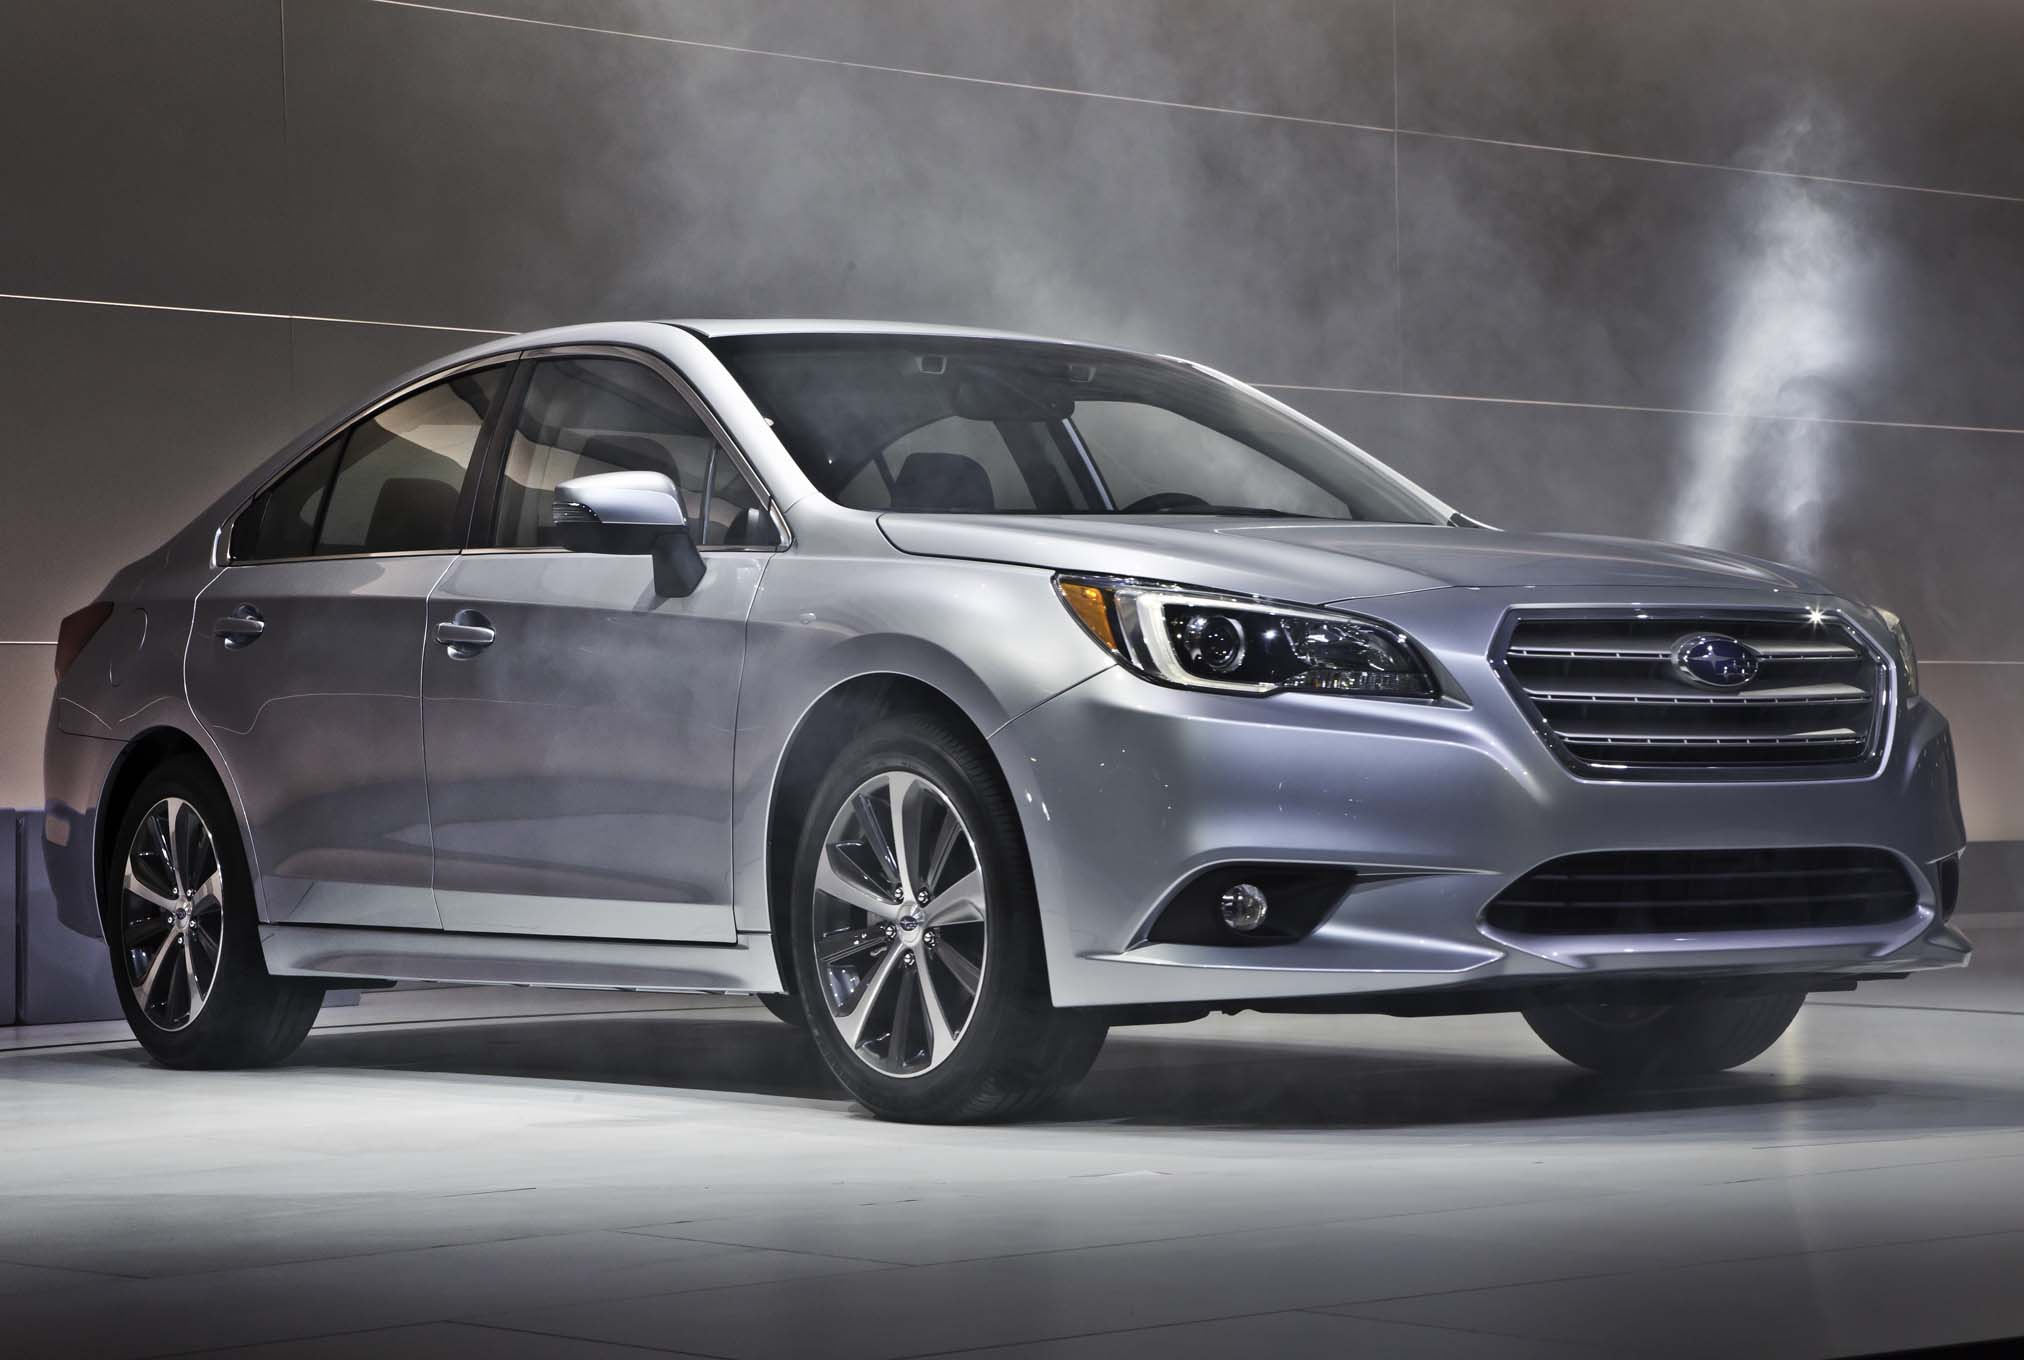 2015 Subaru Legacy Exterior Profile